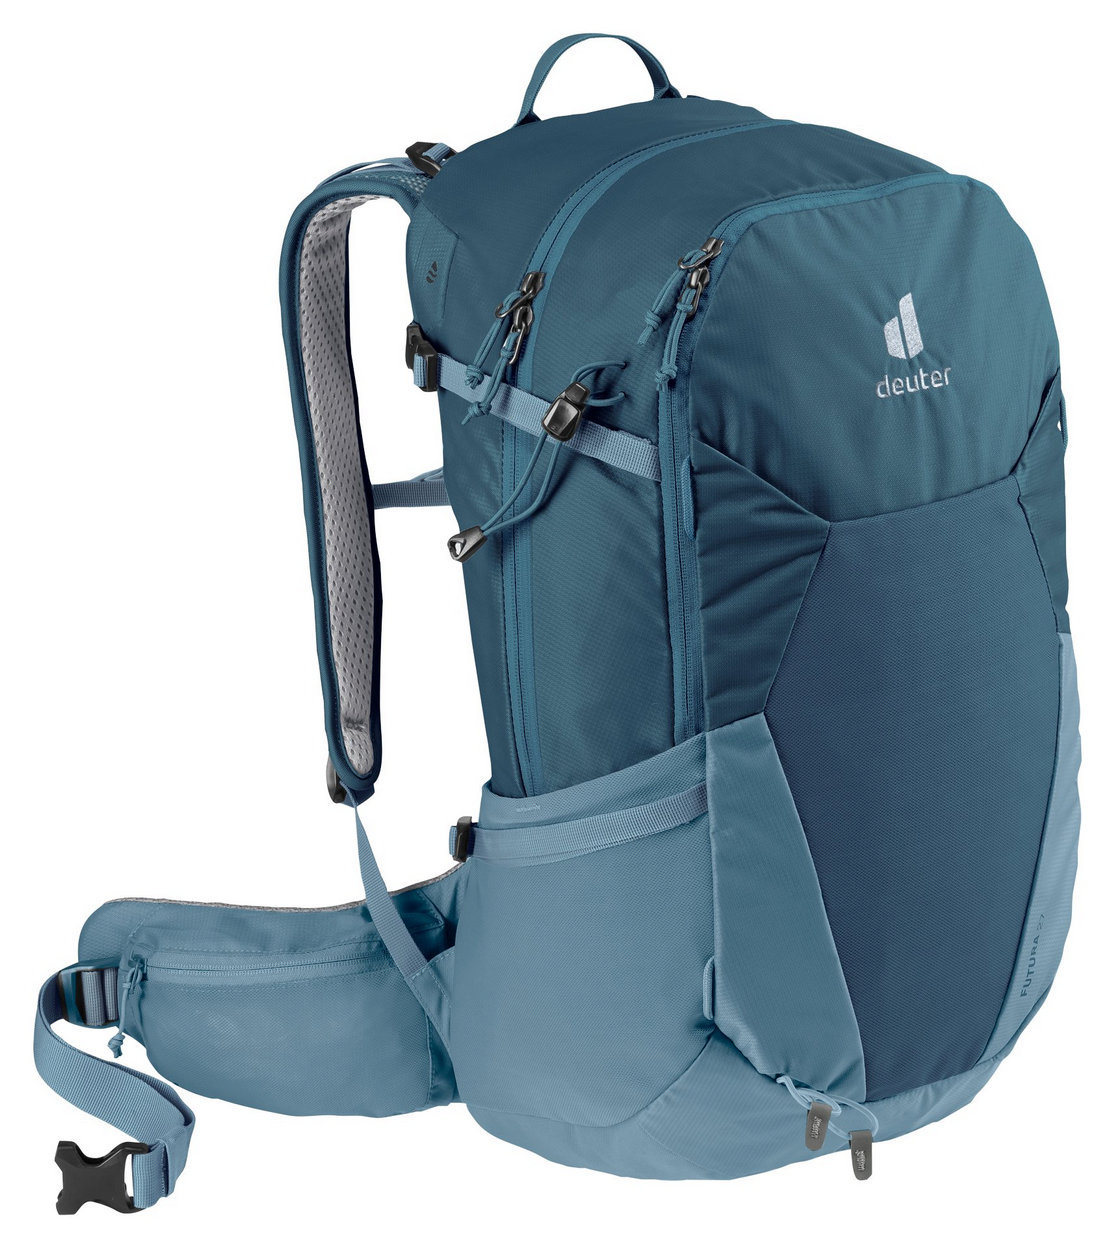 Туристические рюкзаки легкие Рюкзак Deuter Futura 27 (2021) 3400321-3386-Futura_27-d00.jpg